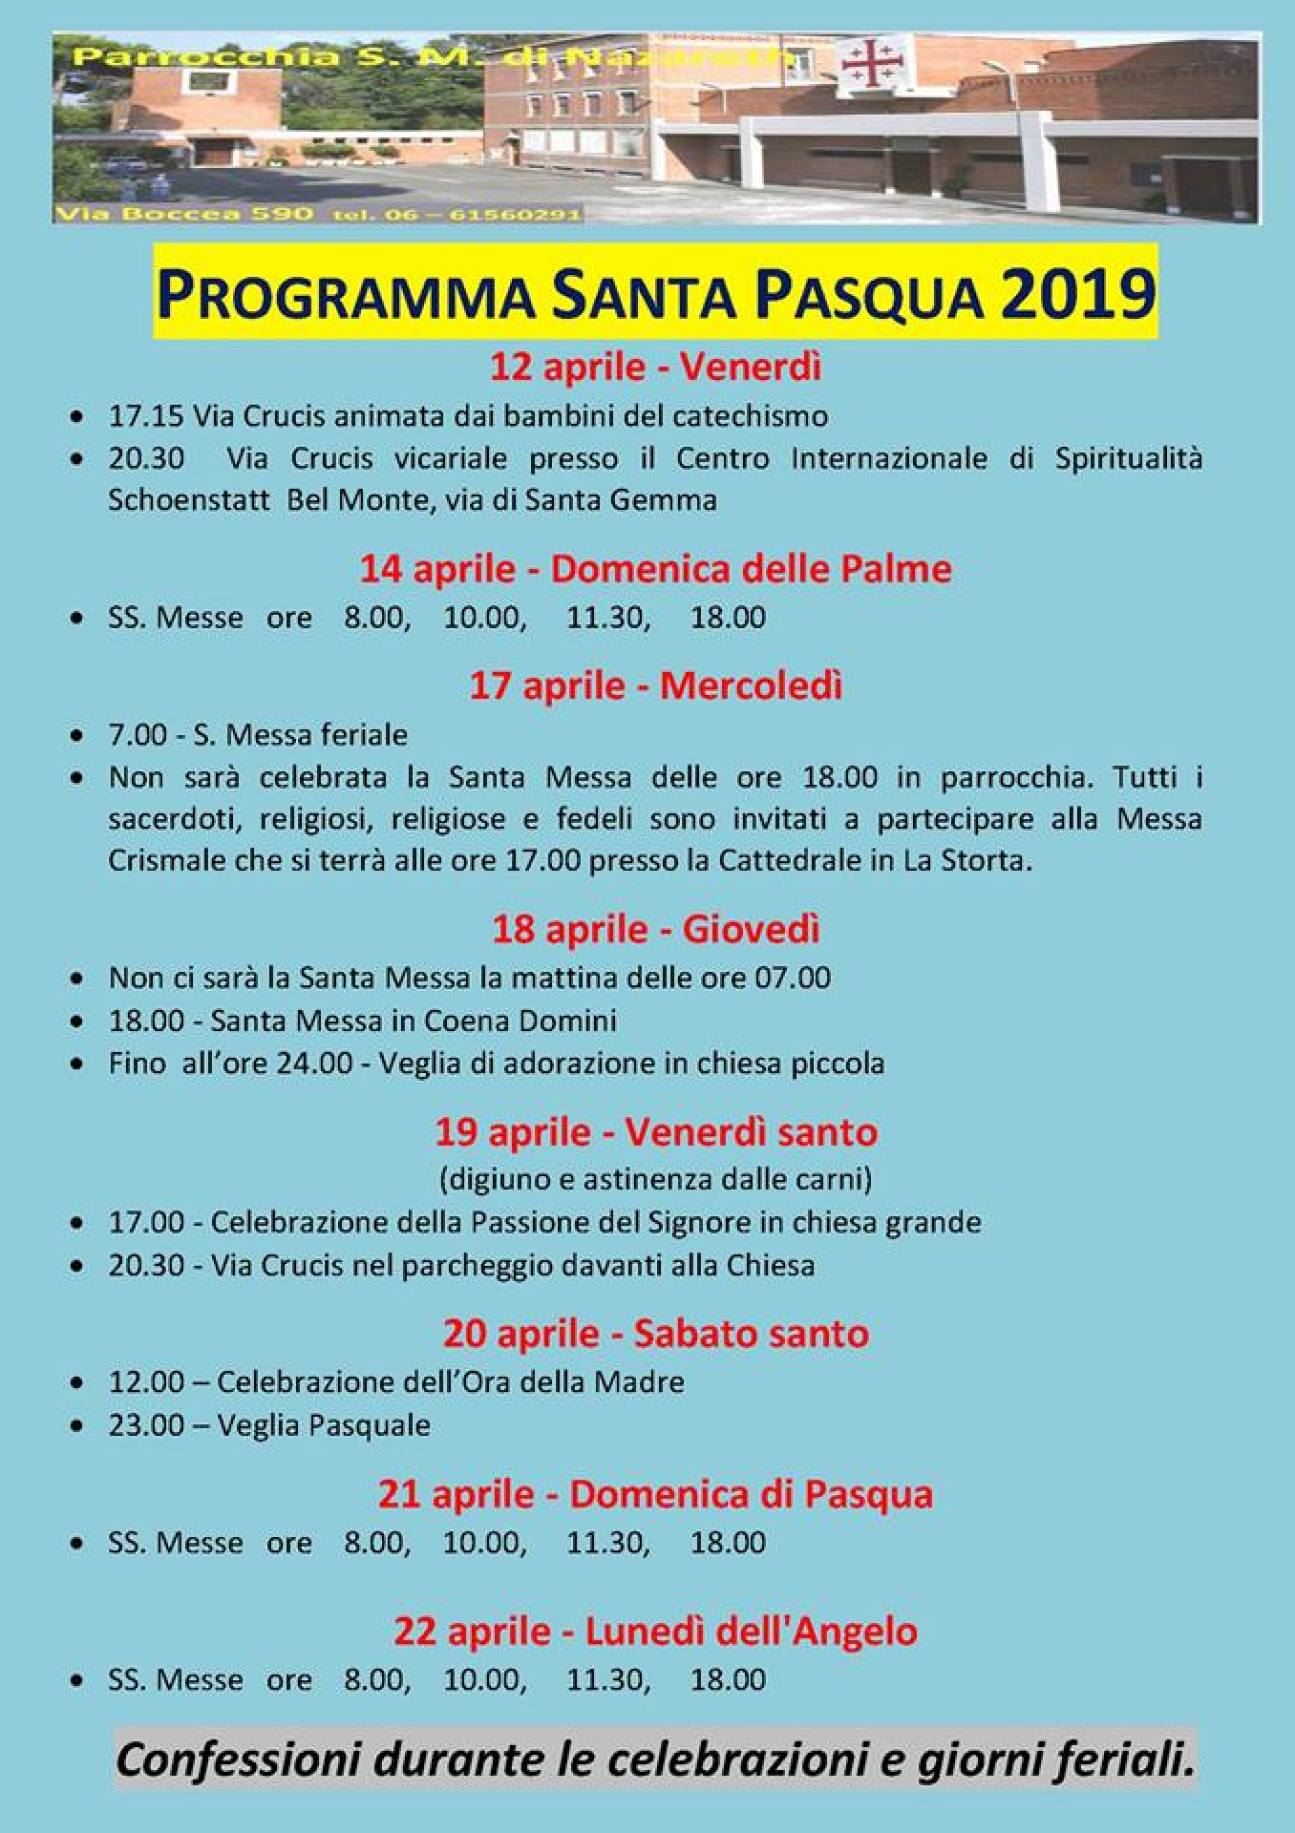 Programma Santa Pasqua 2019